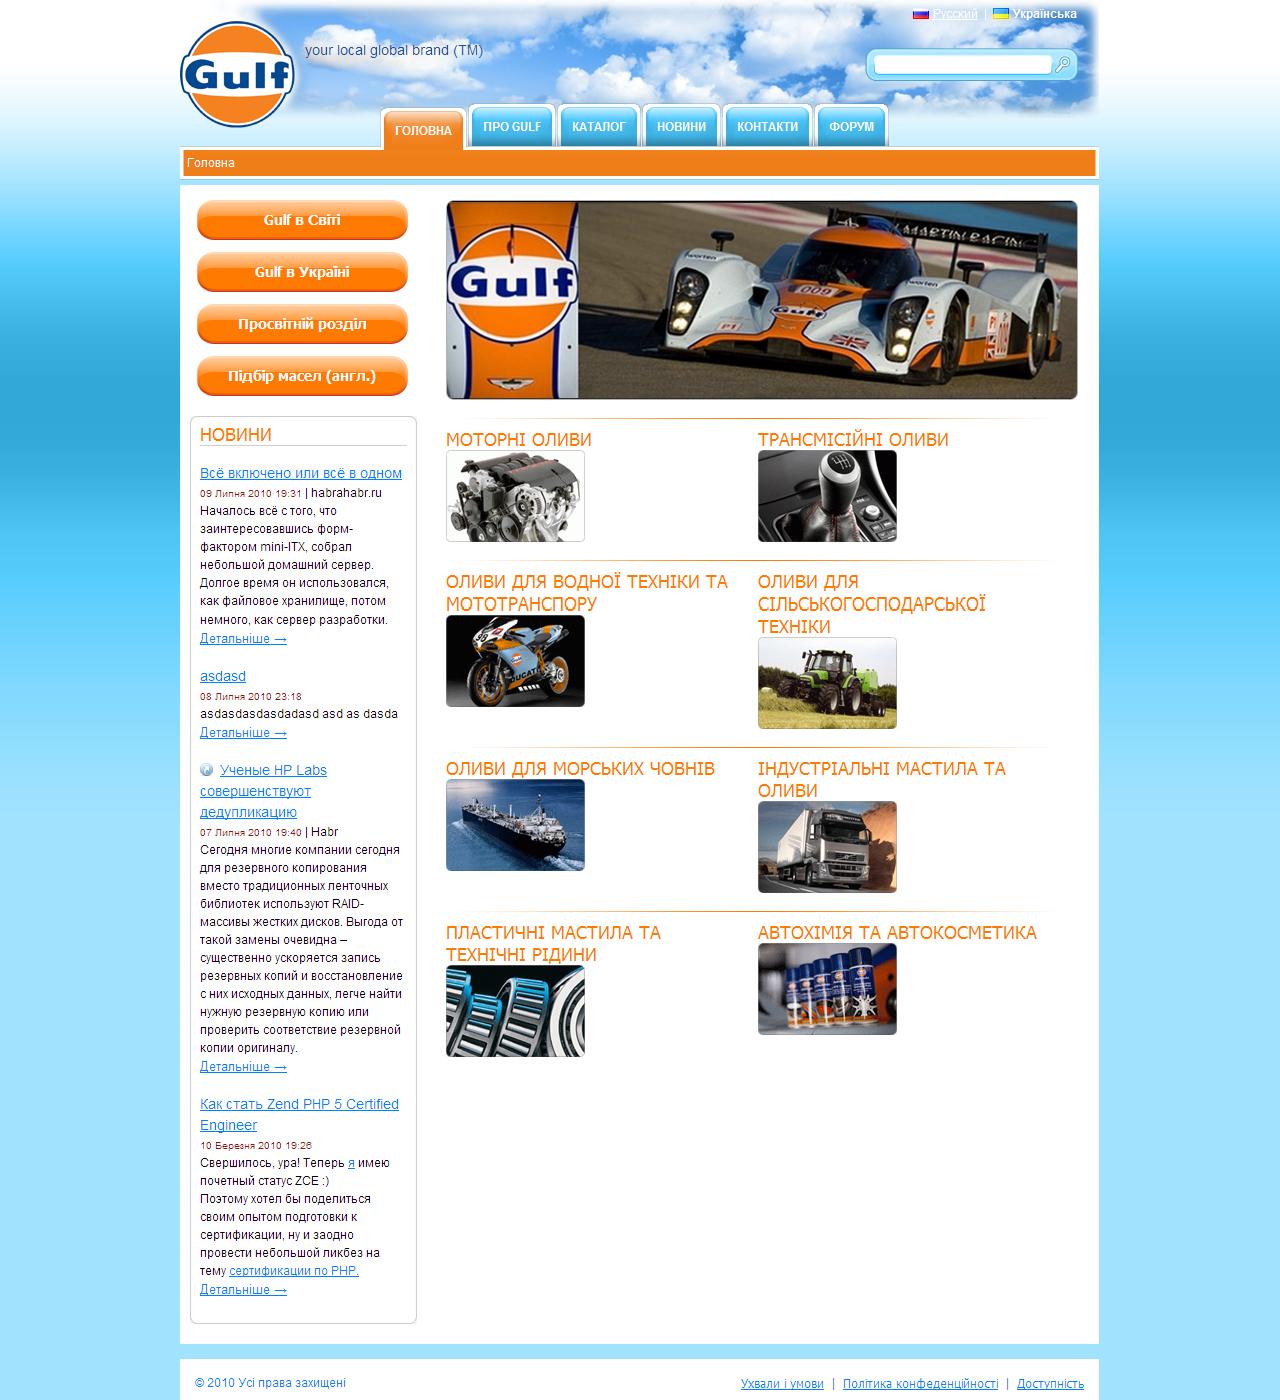 Gulf Oil - сайт машинных масел